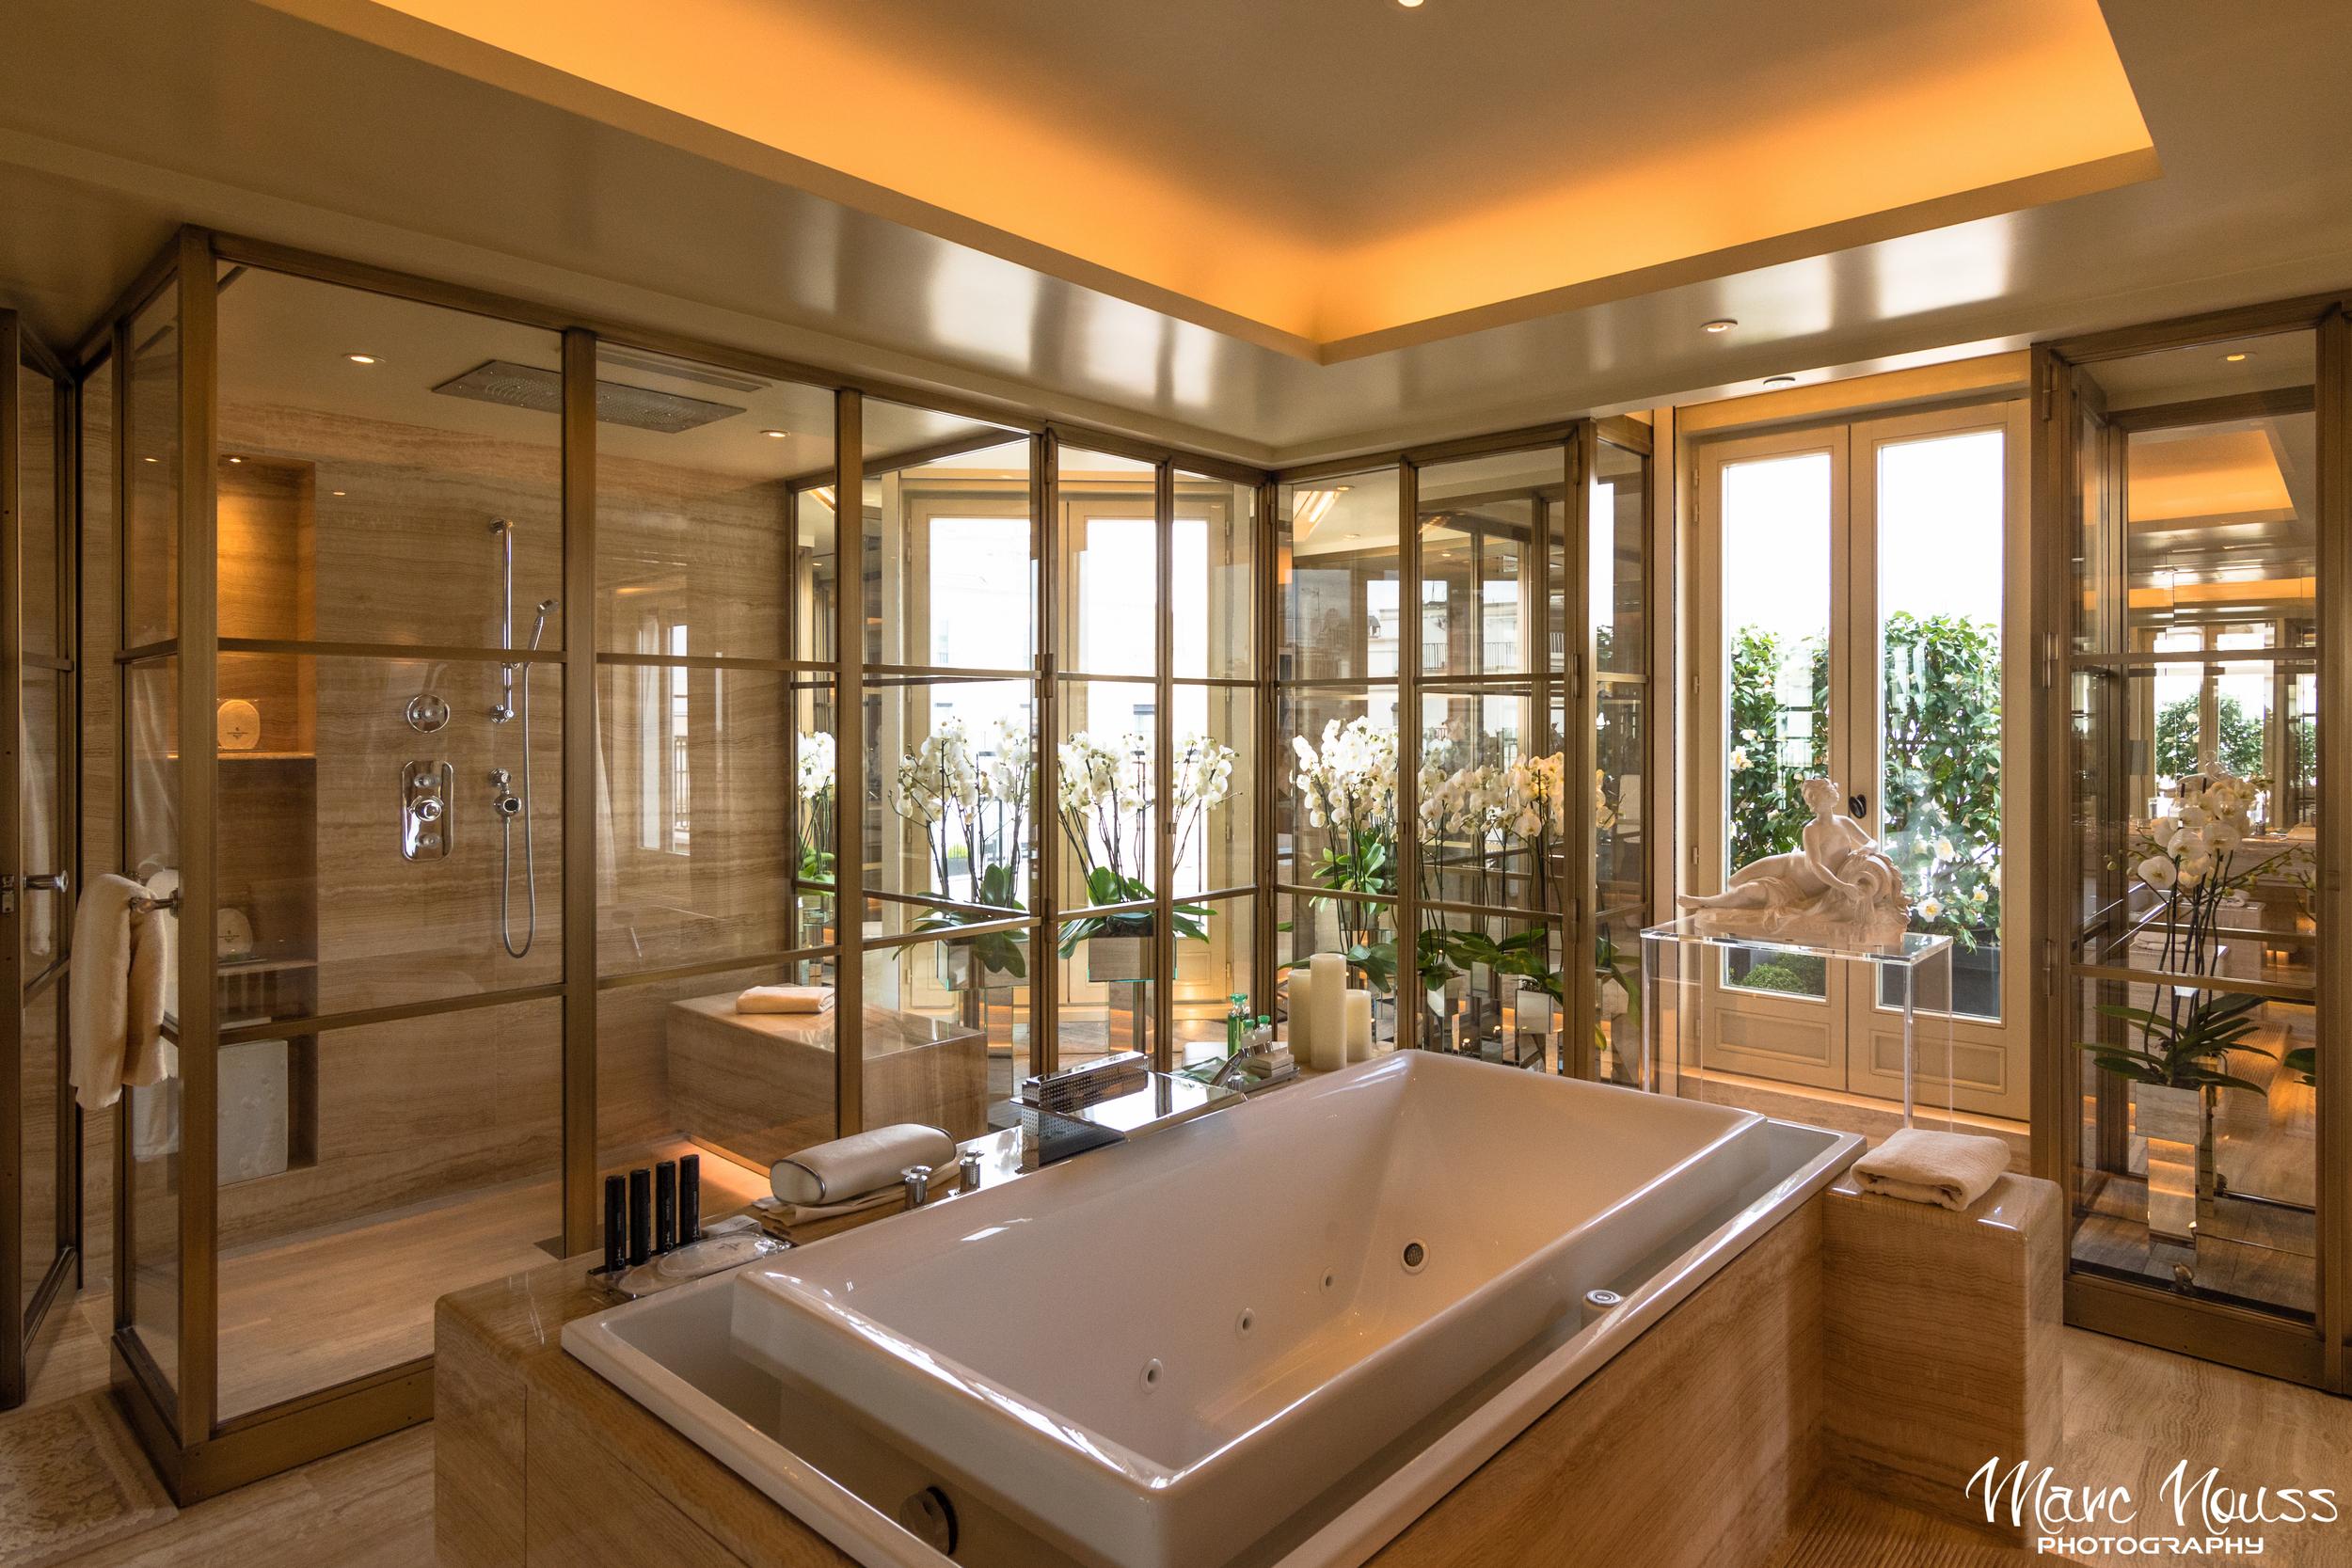 Bathroom inside the Penthouse Suite!